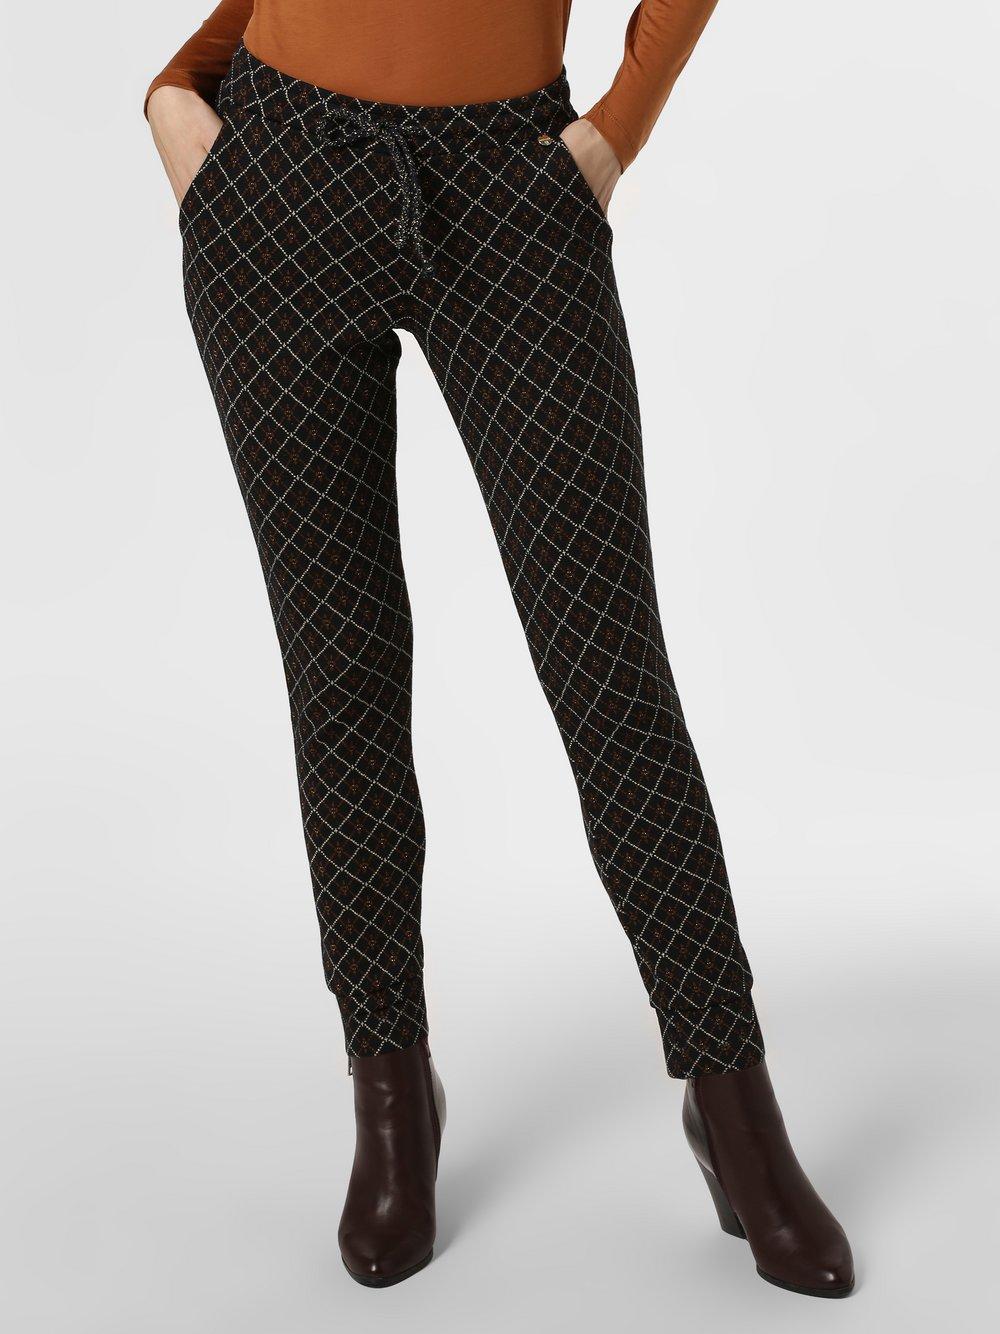 Rich & Royal Damen Hose online kaufen   VANGRAAF.COM